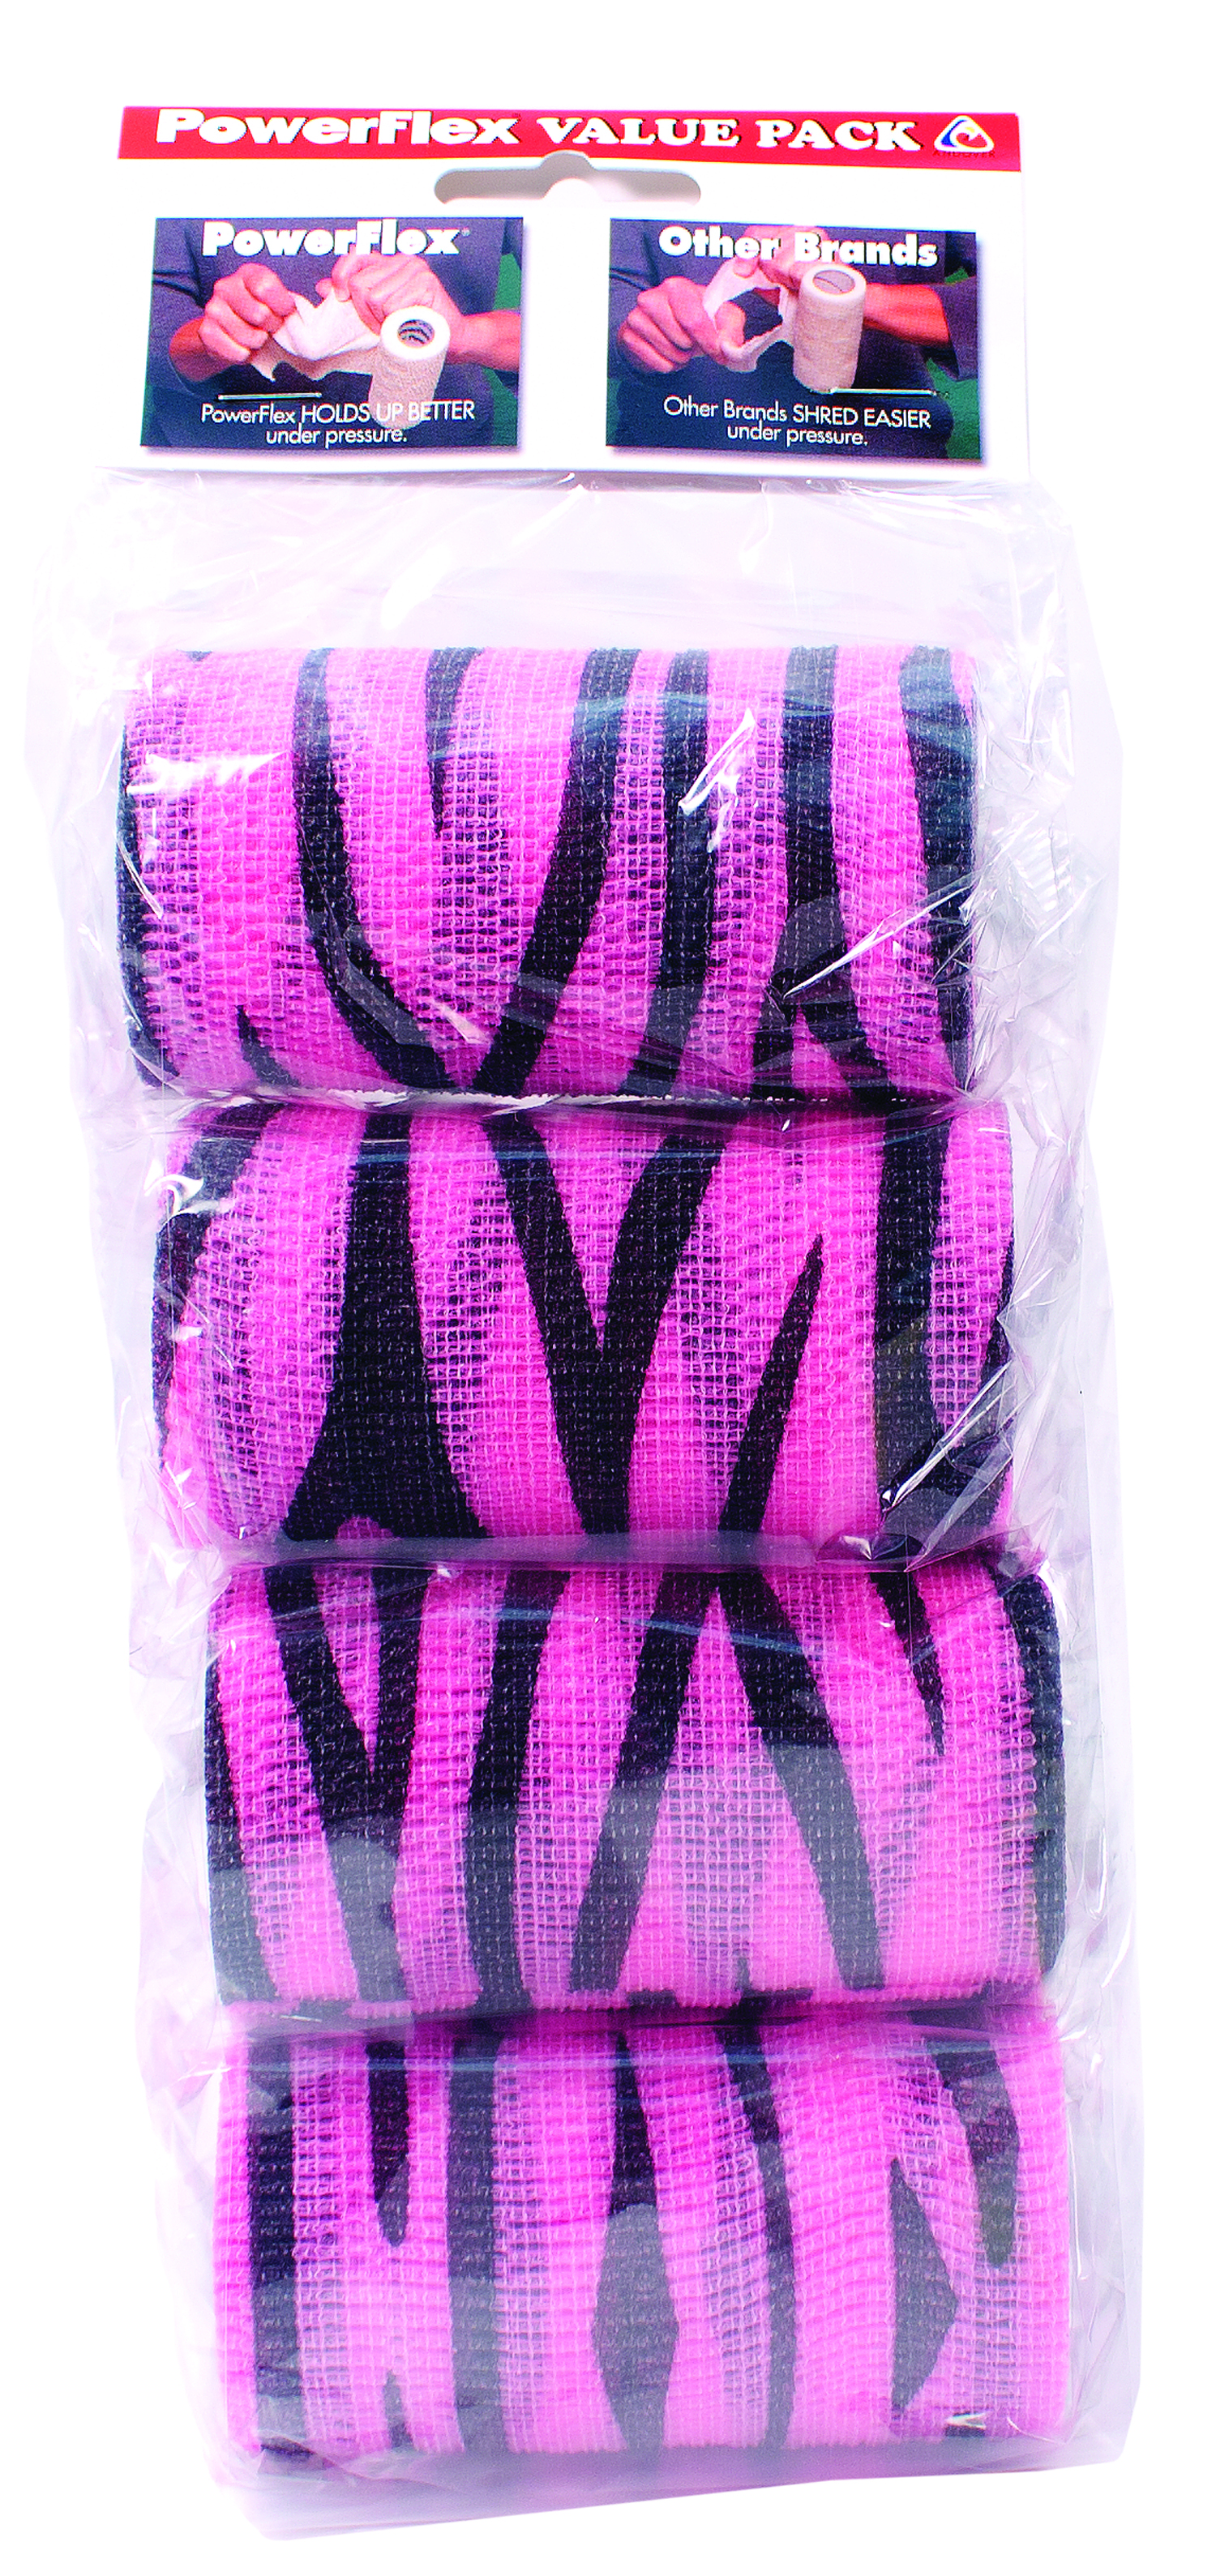 Powerflex Value Pack - Pink Zebra